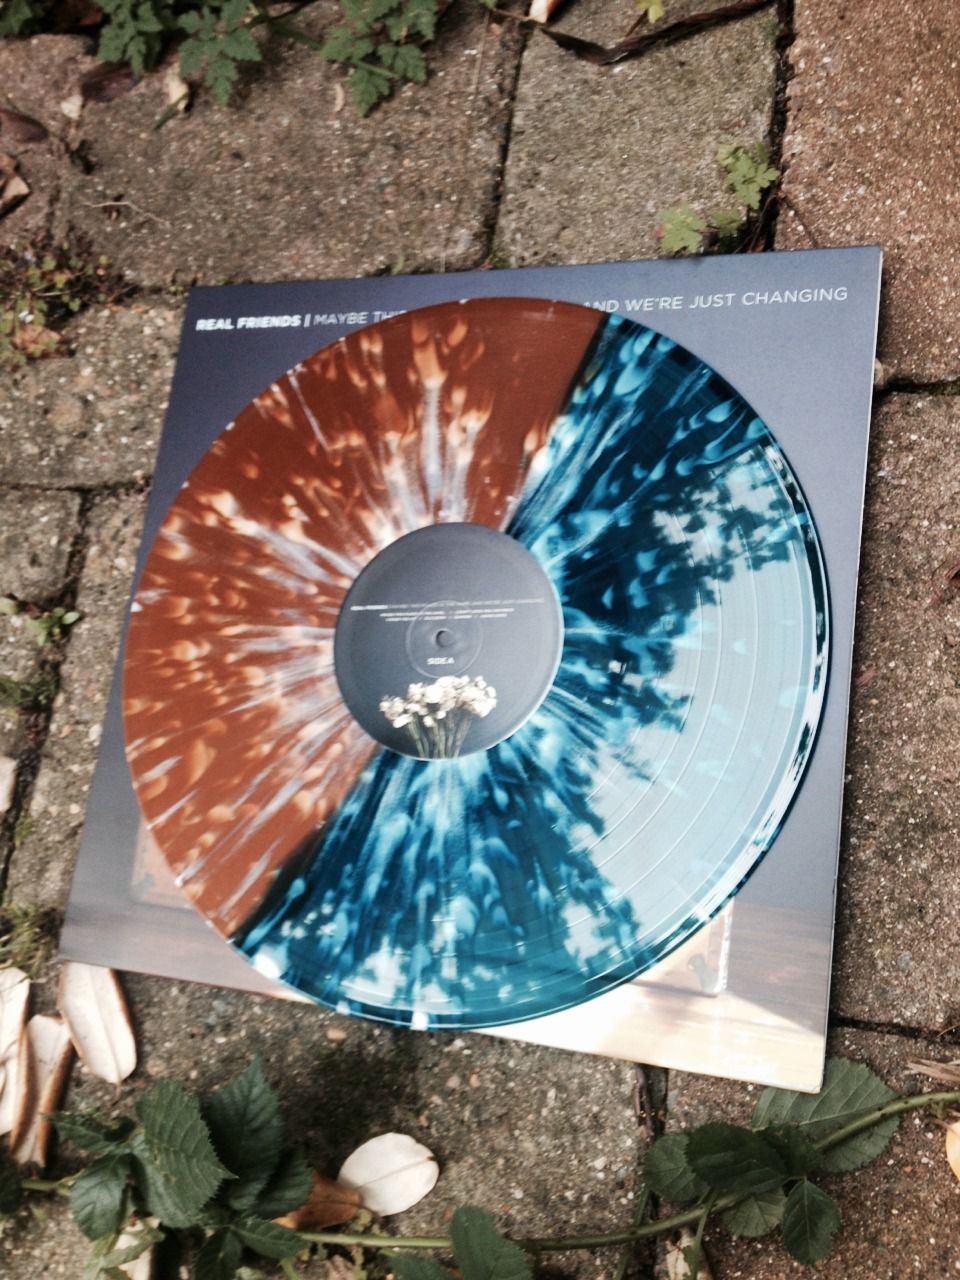 Real Friends Vinyl In 2019 Vinyl Record Player Vinyl